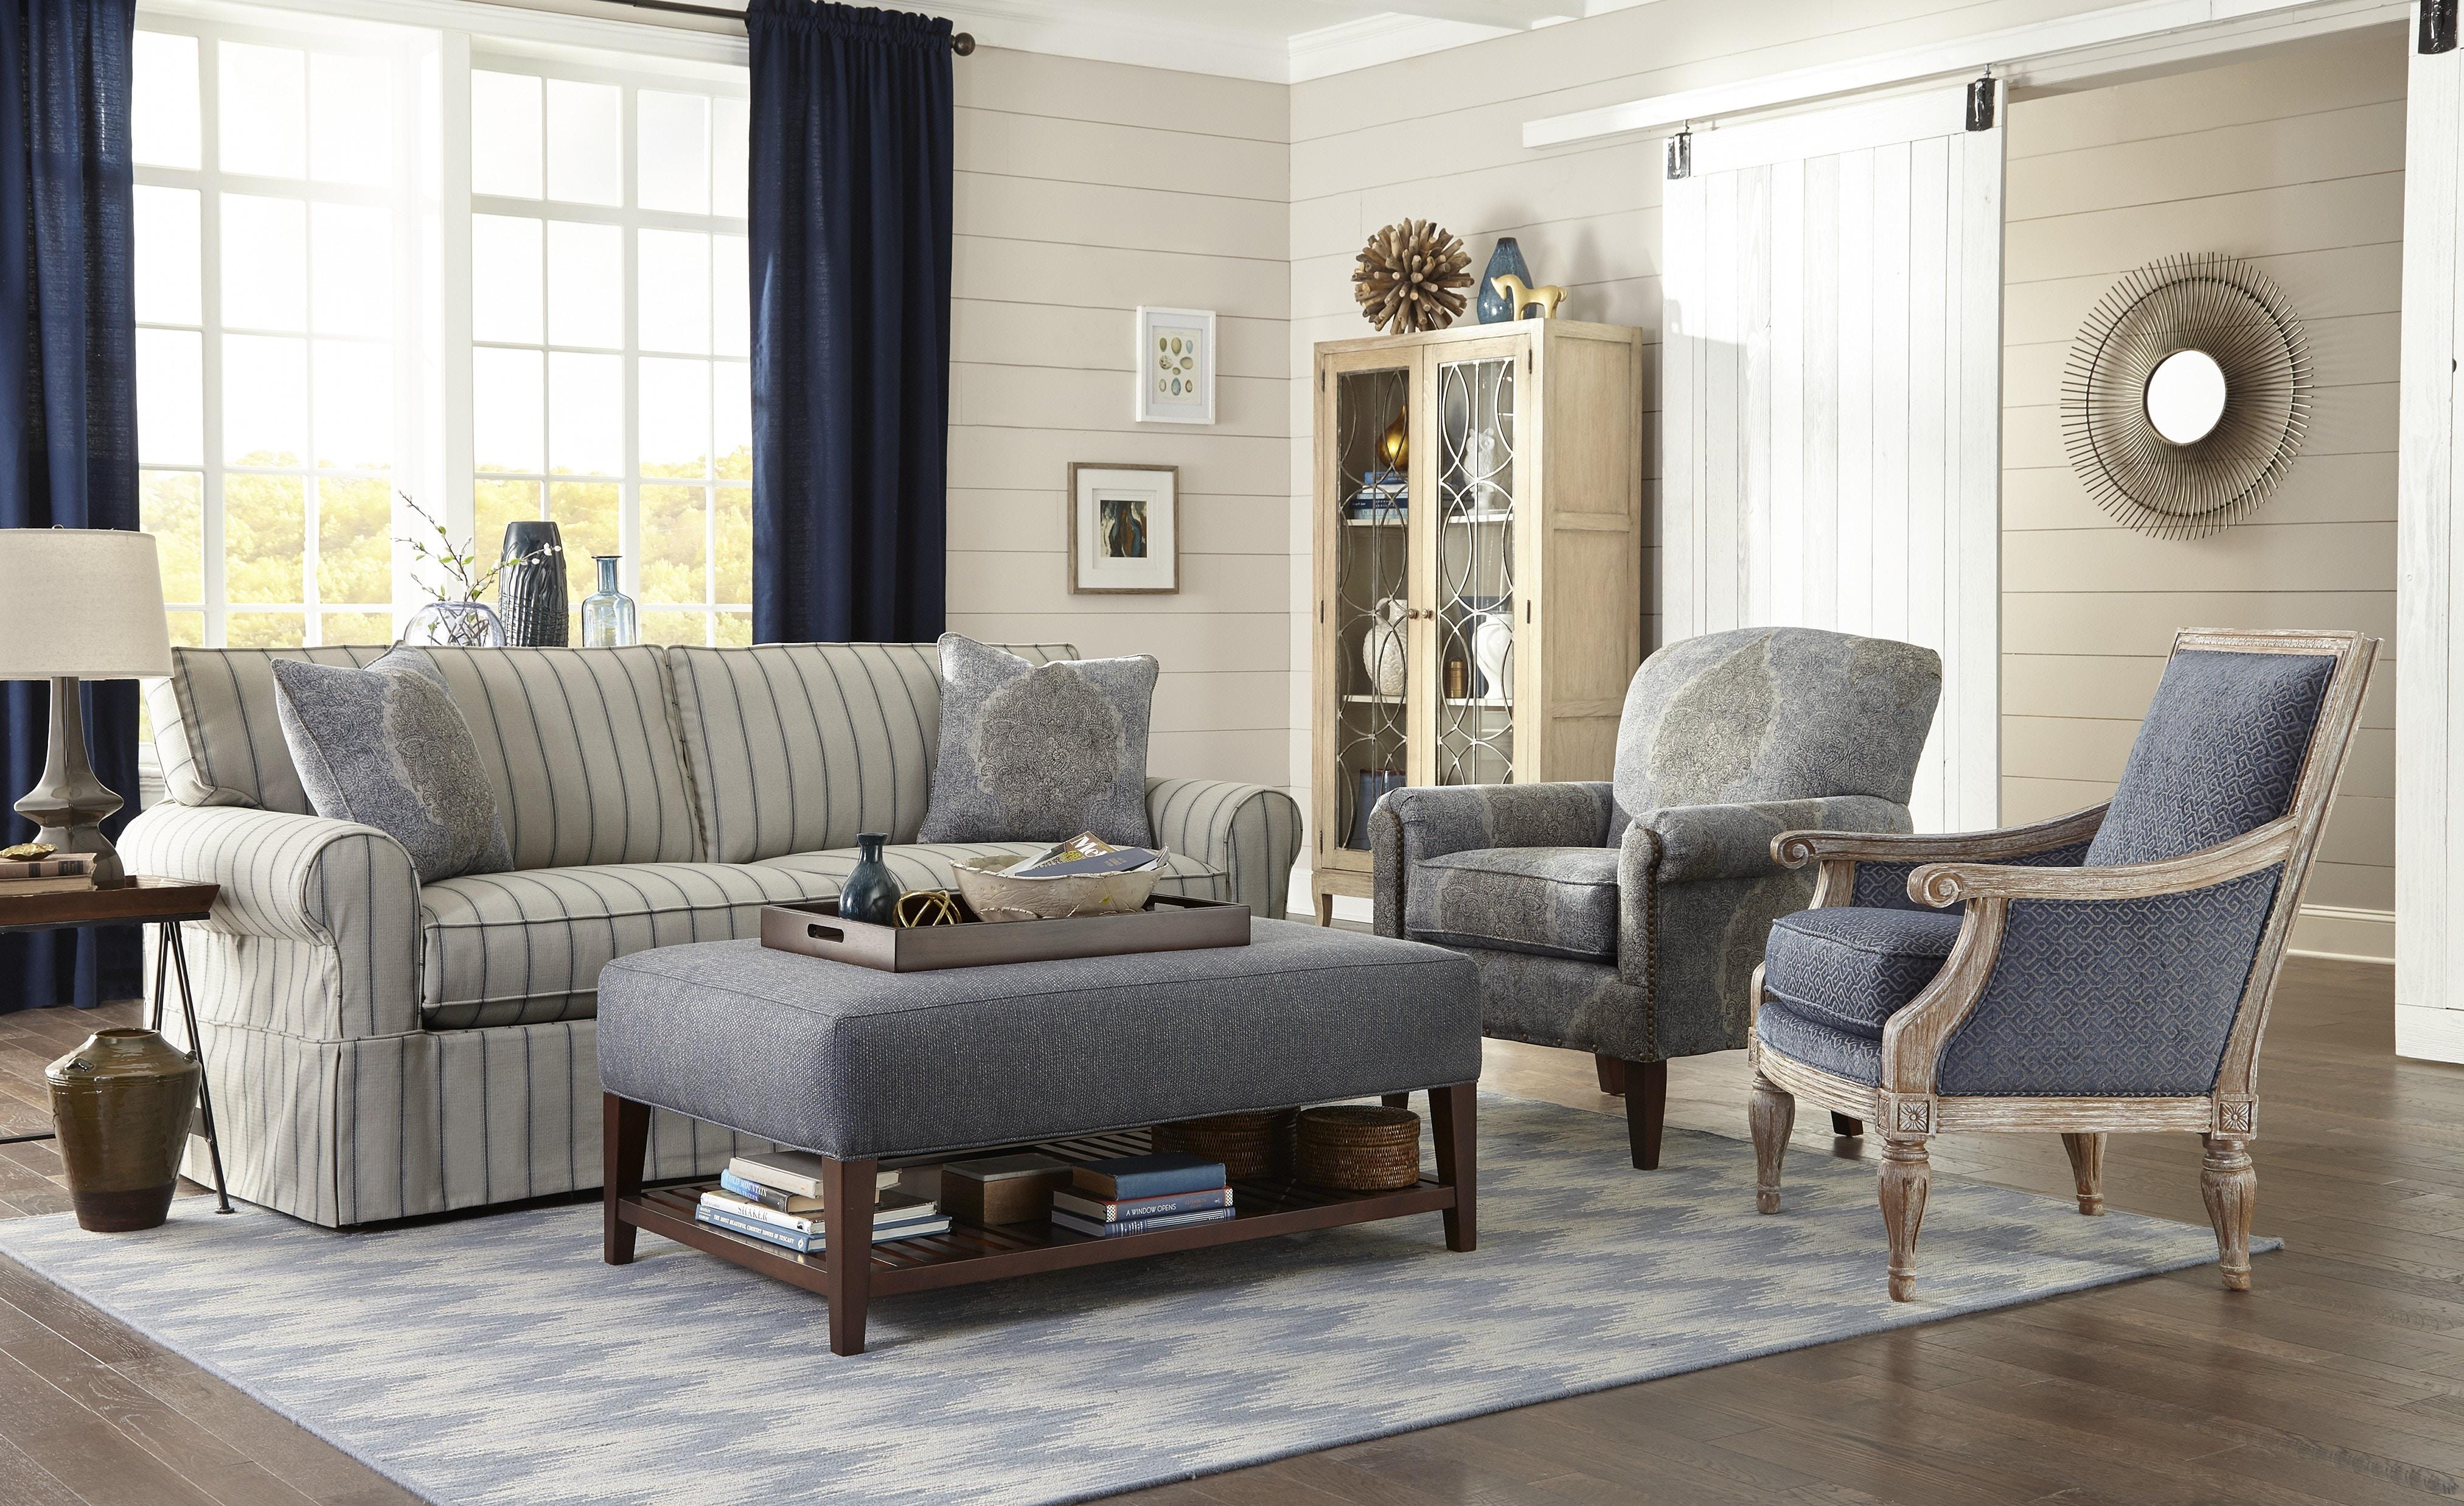 Craftmaster Sofa 922850 (Sleeper Also Available)